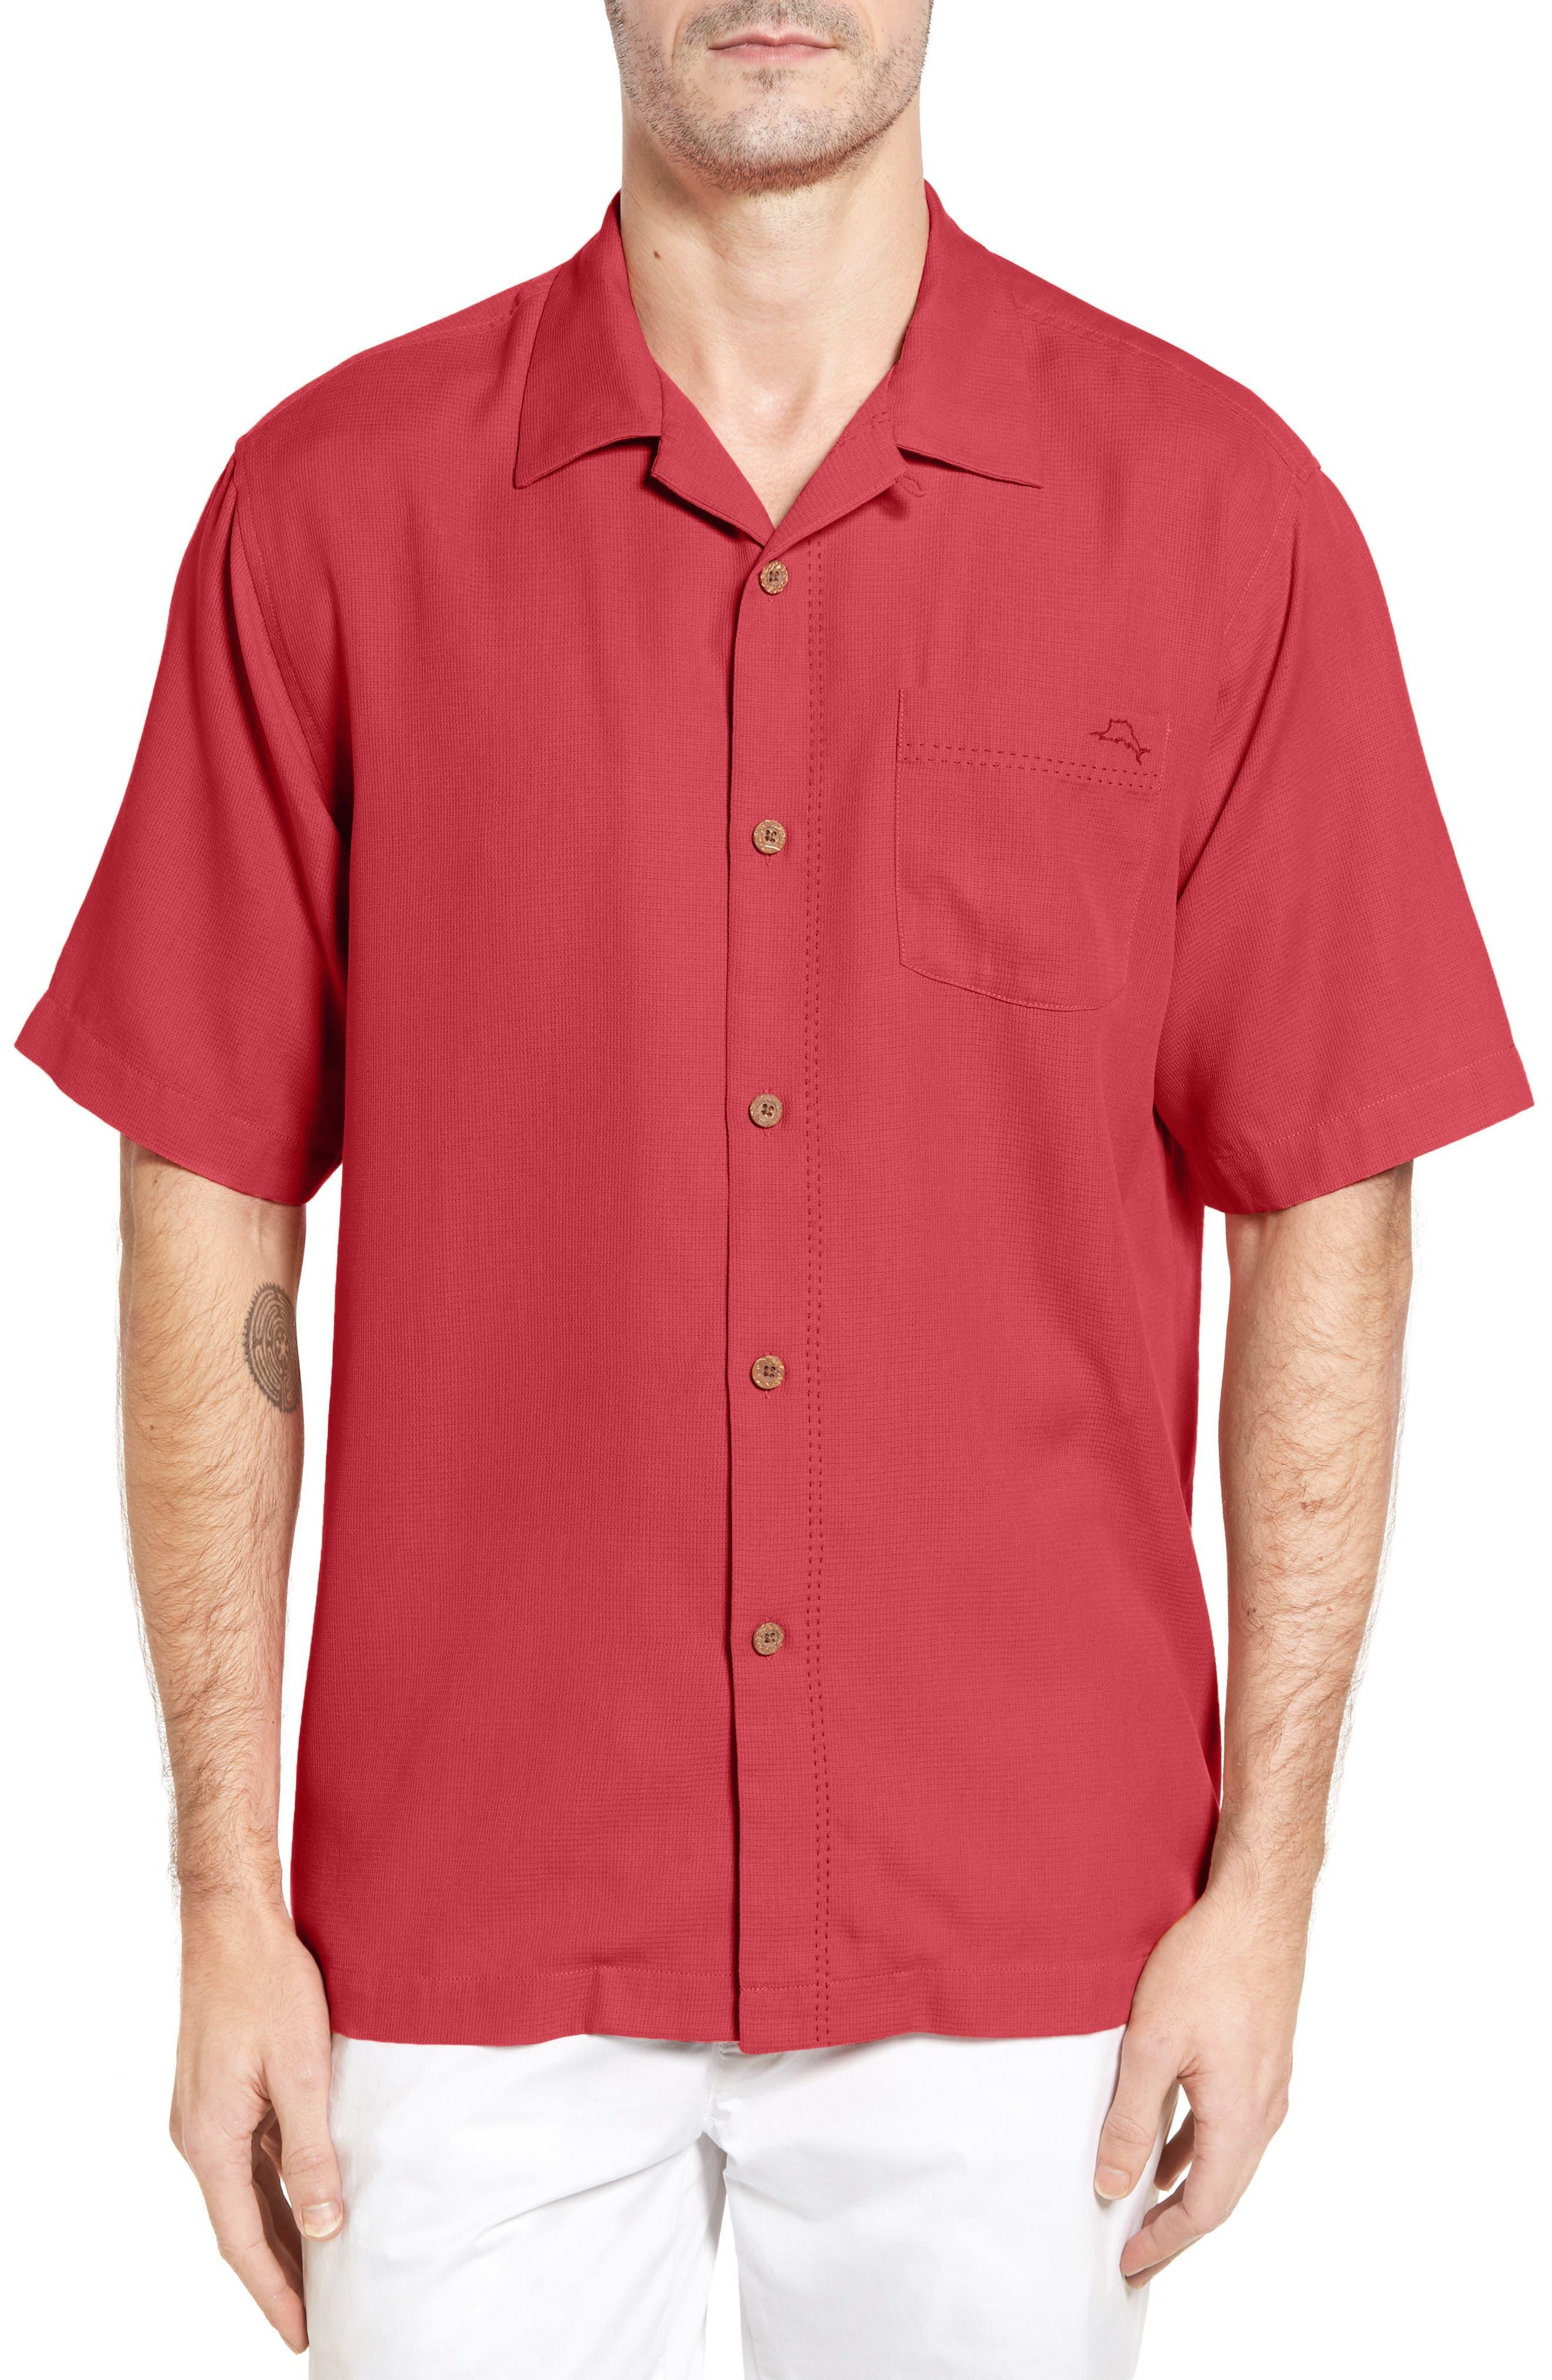 Alternate Image 1 Selected - Tommy Bahama Royal Bermuda Silk Blend Camp Shirt